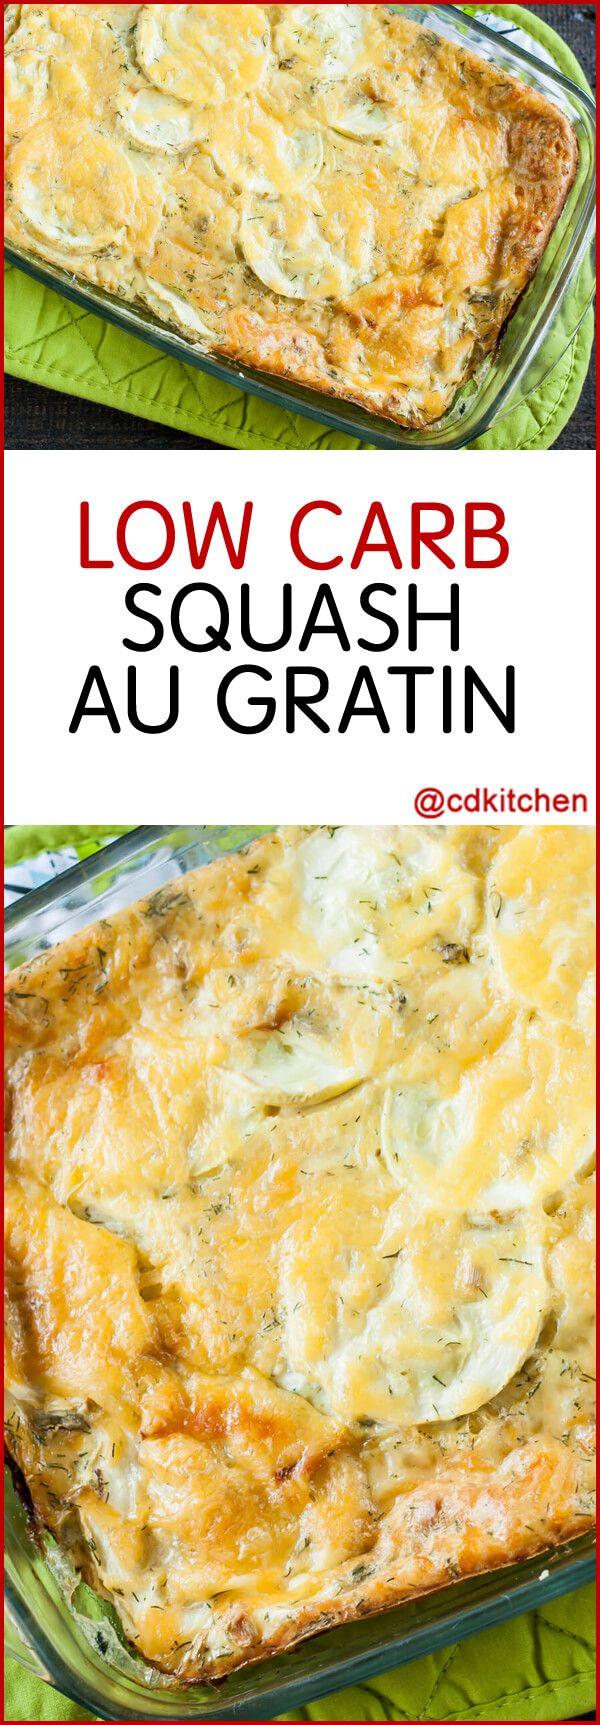 Low Carb Squash Au Gratin Recipe | CDKitchen.com